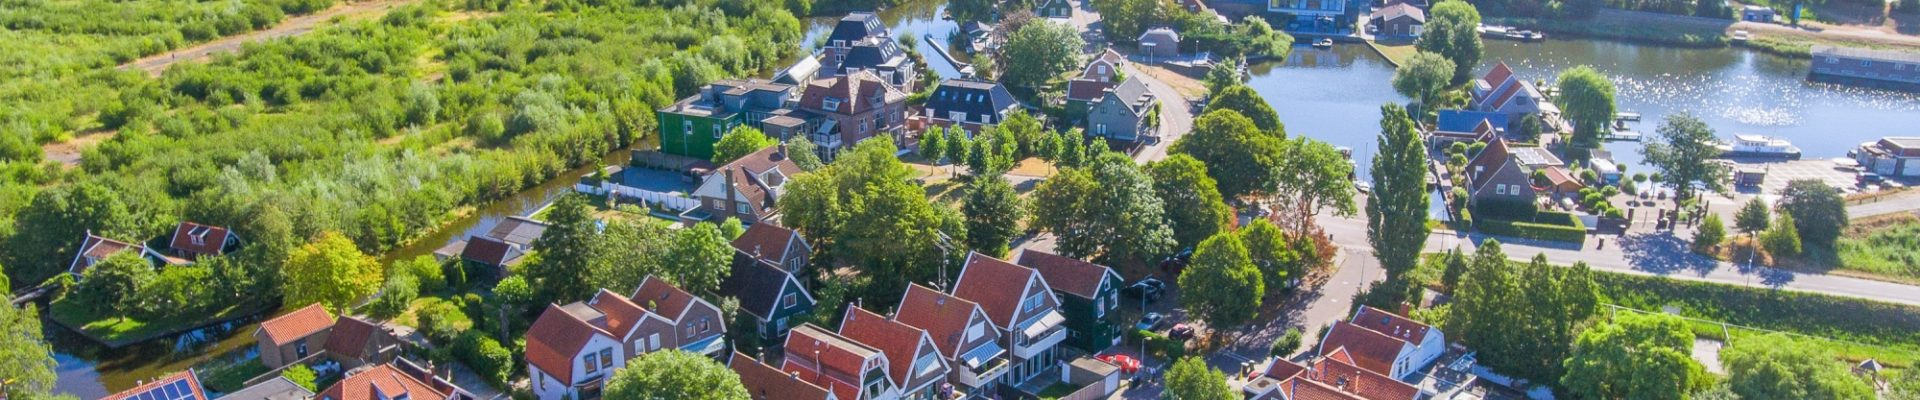 Kadaster Drone Fotografie 1